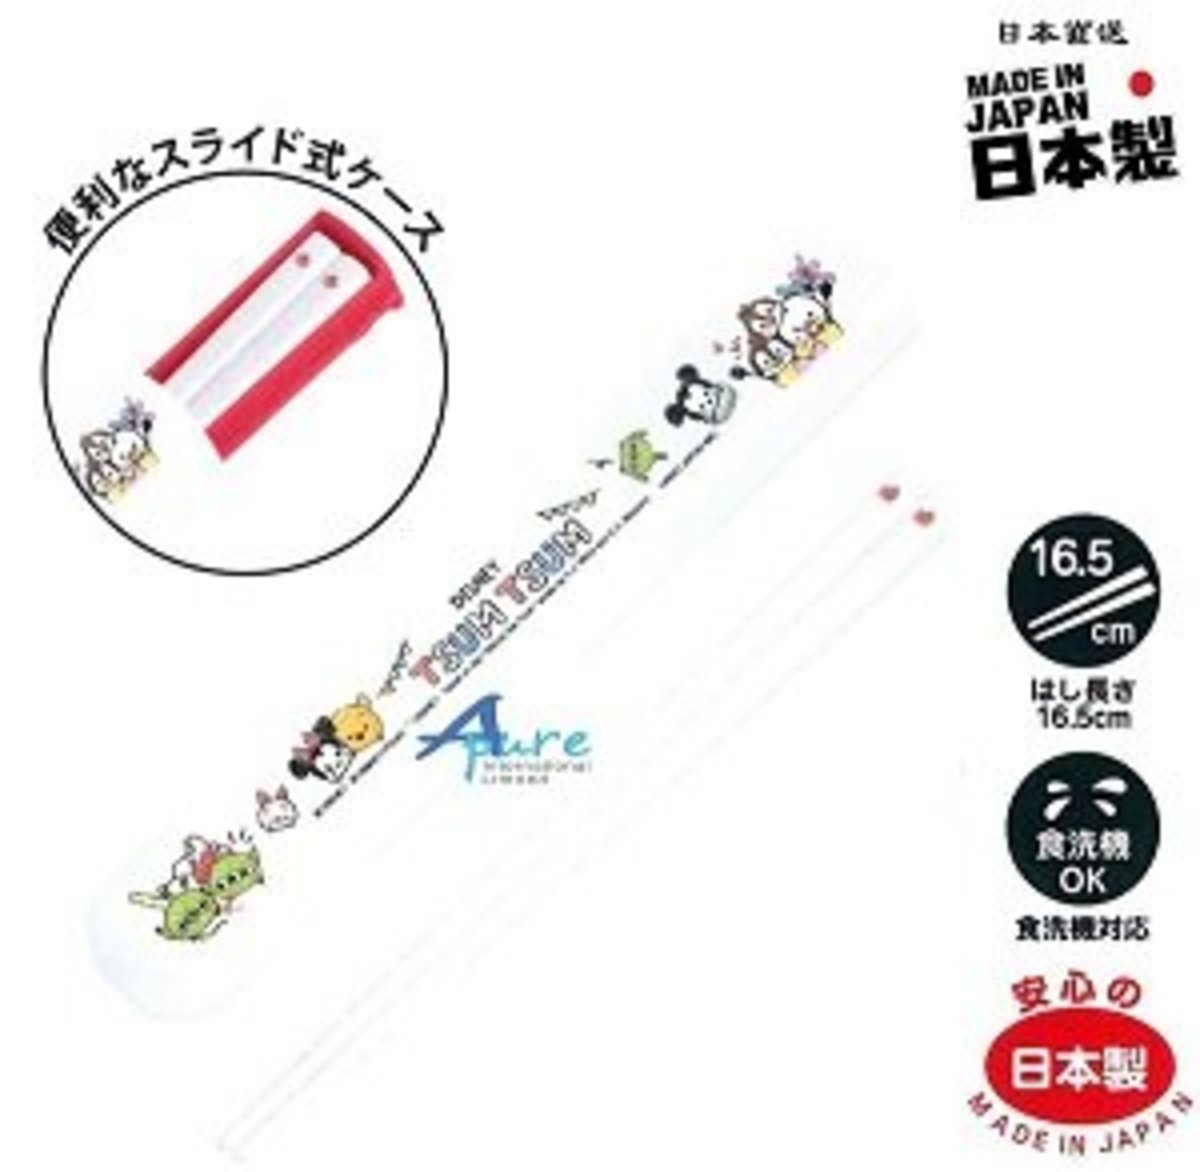 16.5 cm Chopsticks With Box Set (Parallel Import)